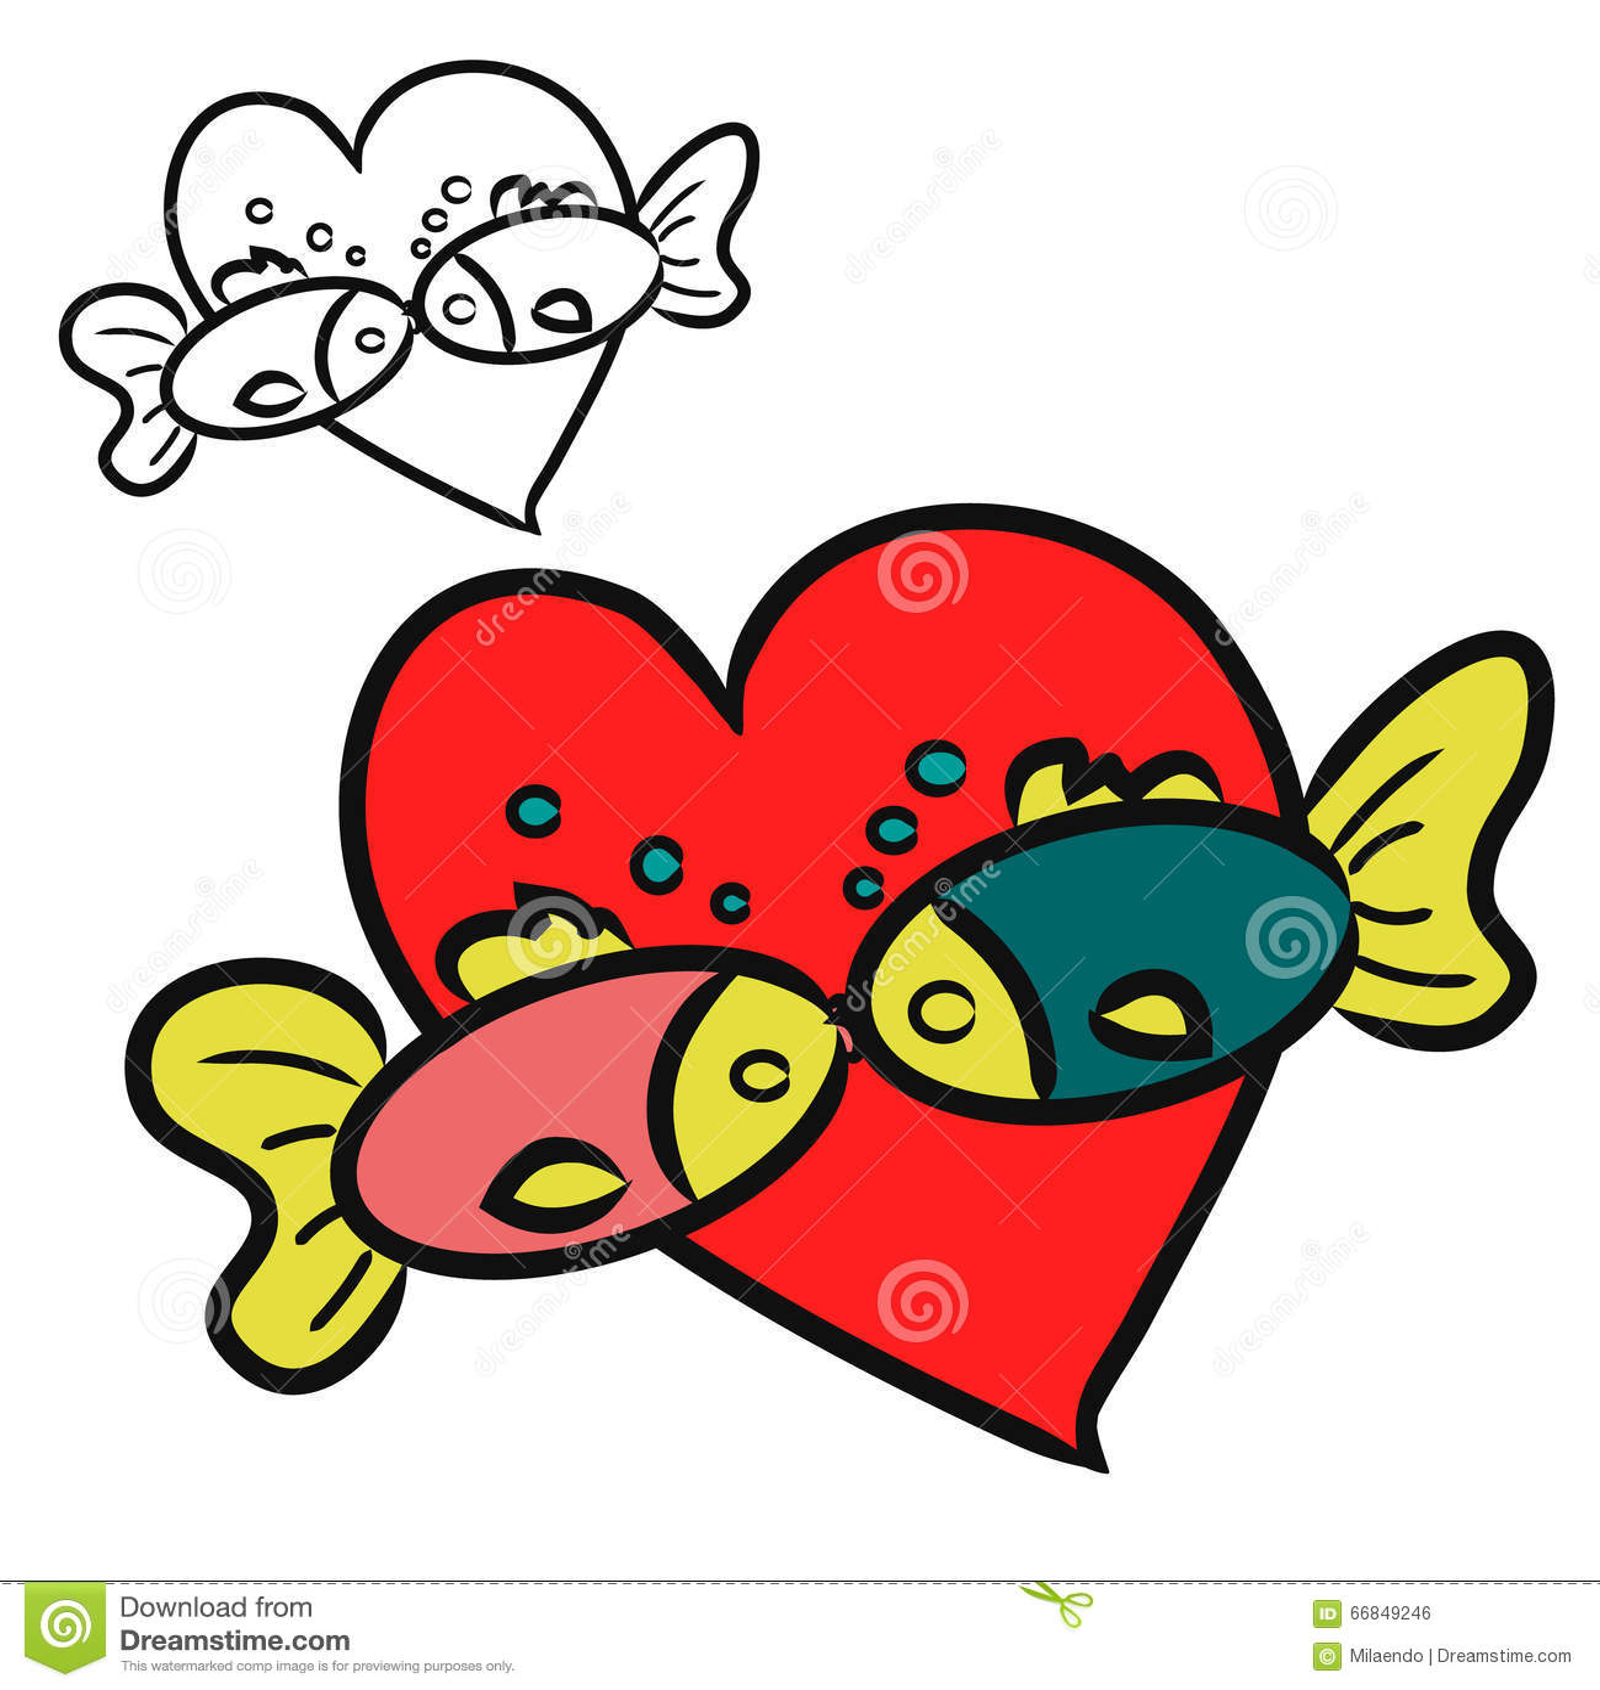 qq西游黑鱼精在哪_西游记那两条鱼叫啥-